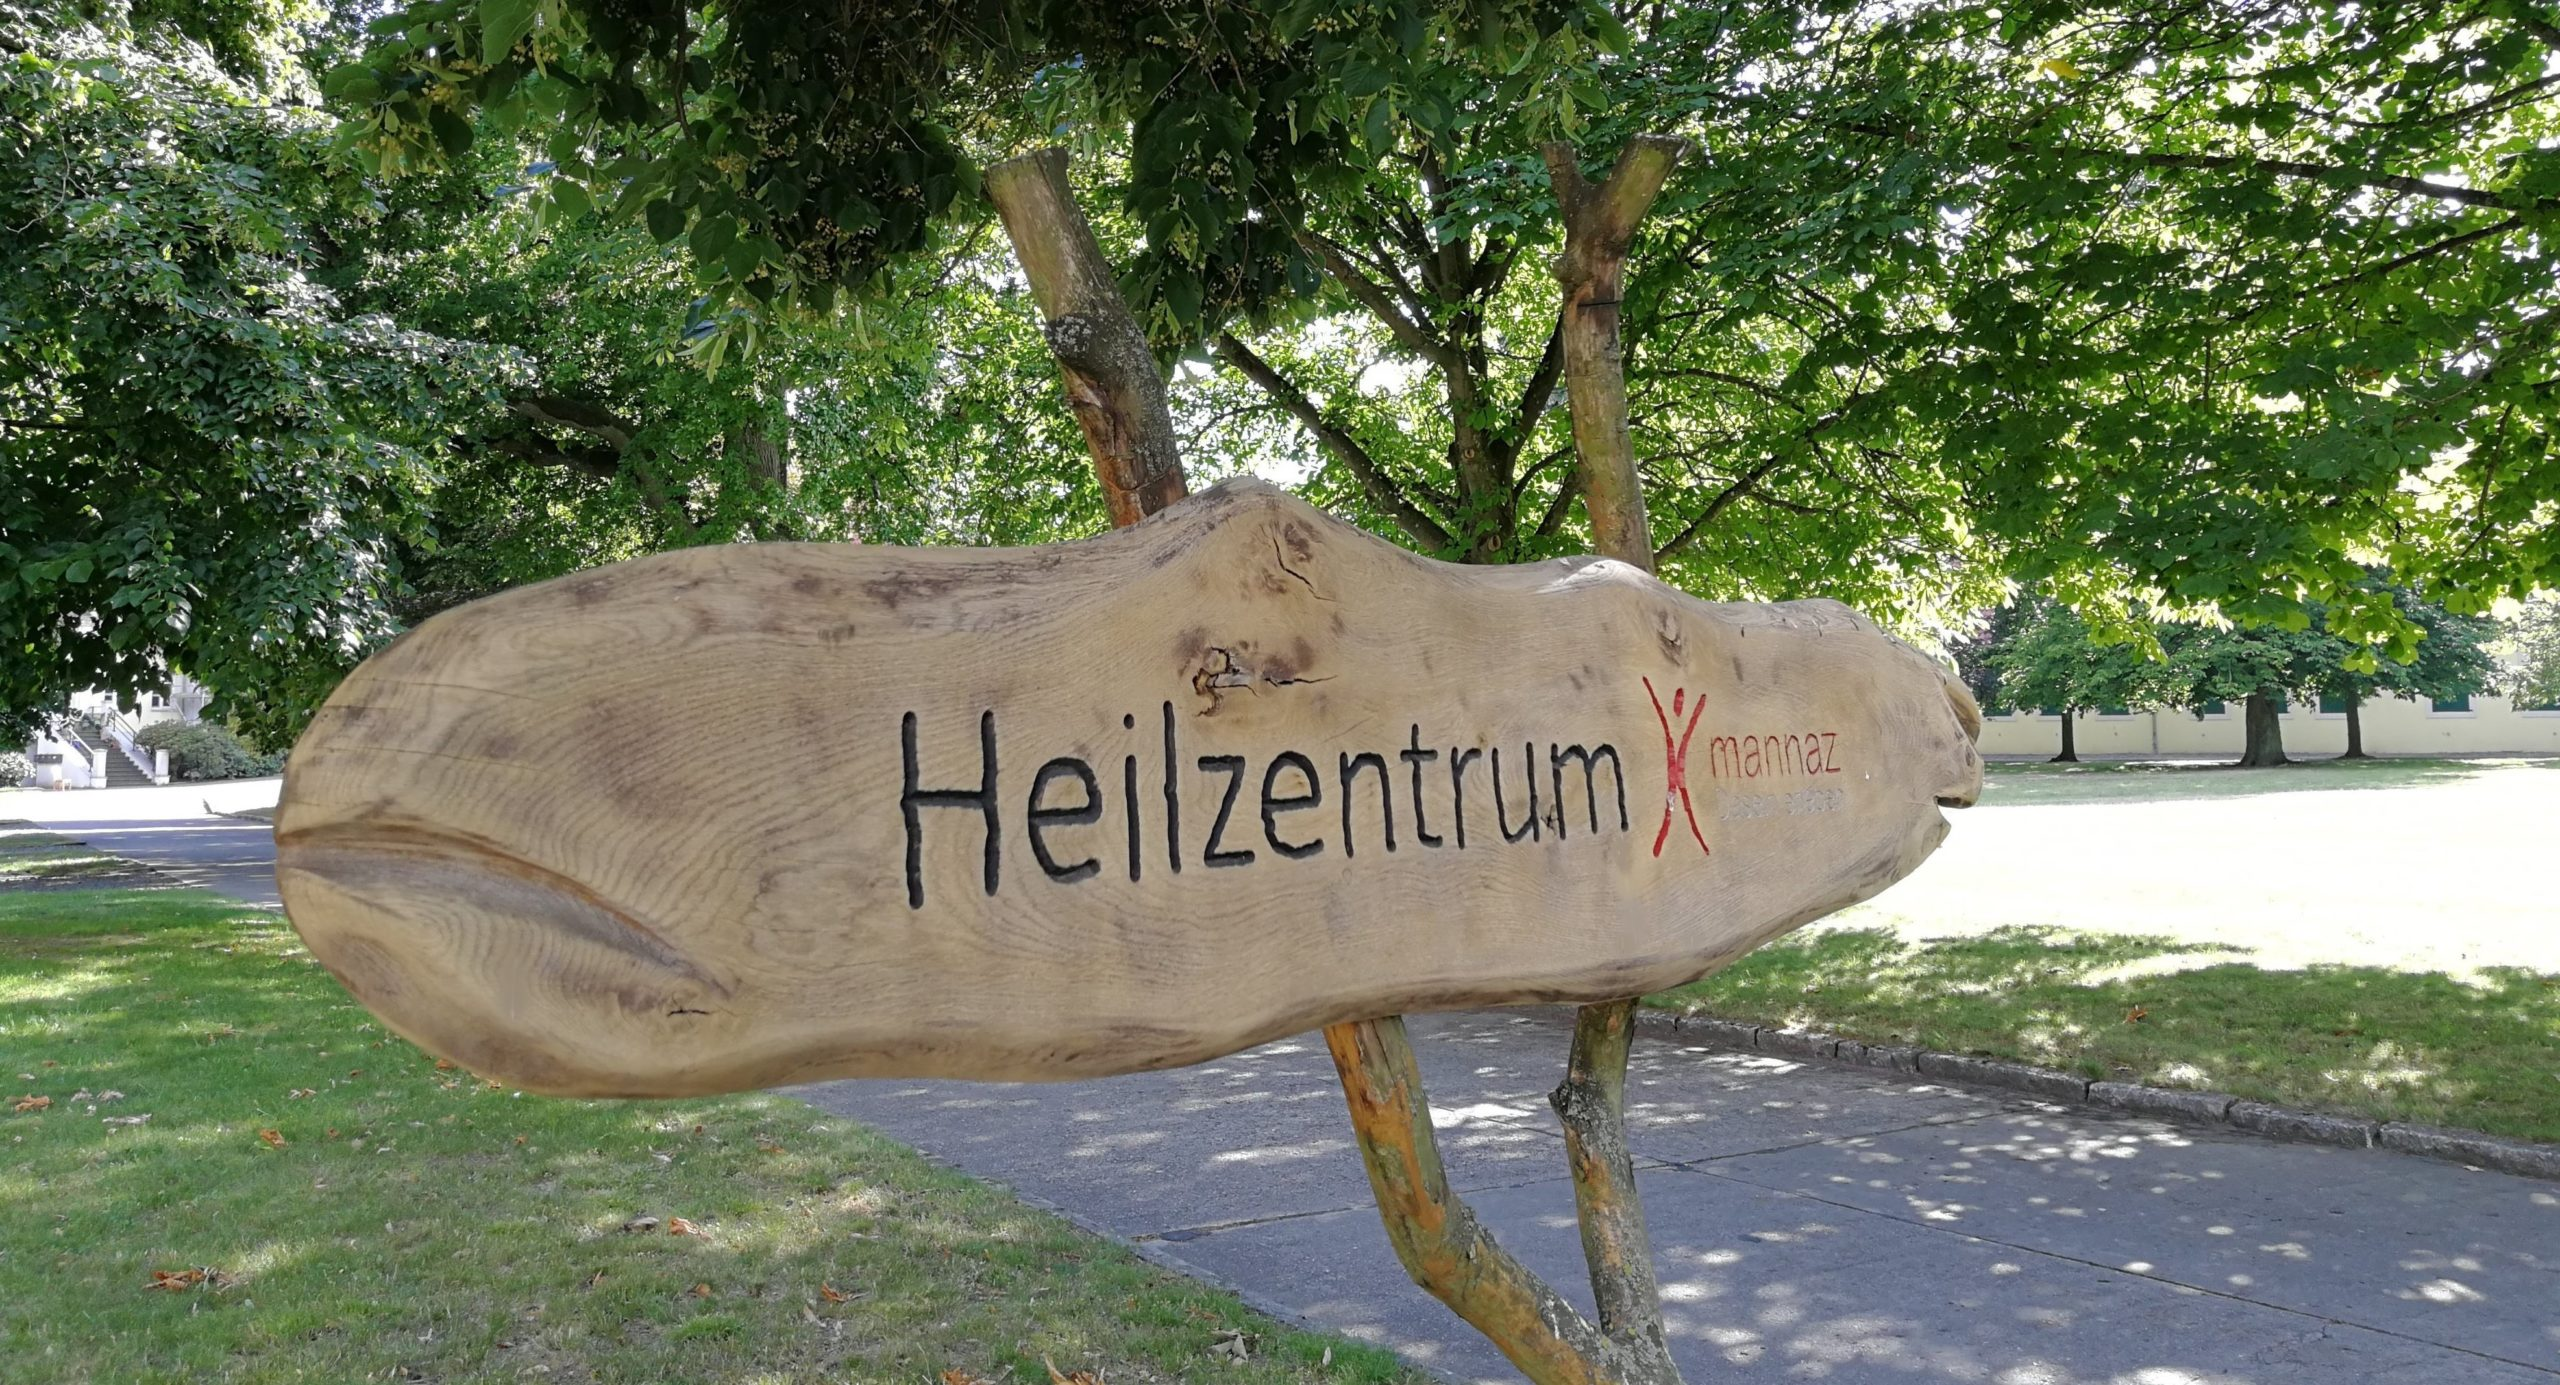 heilzentrum - short